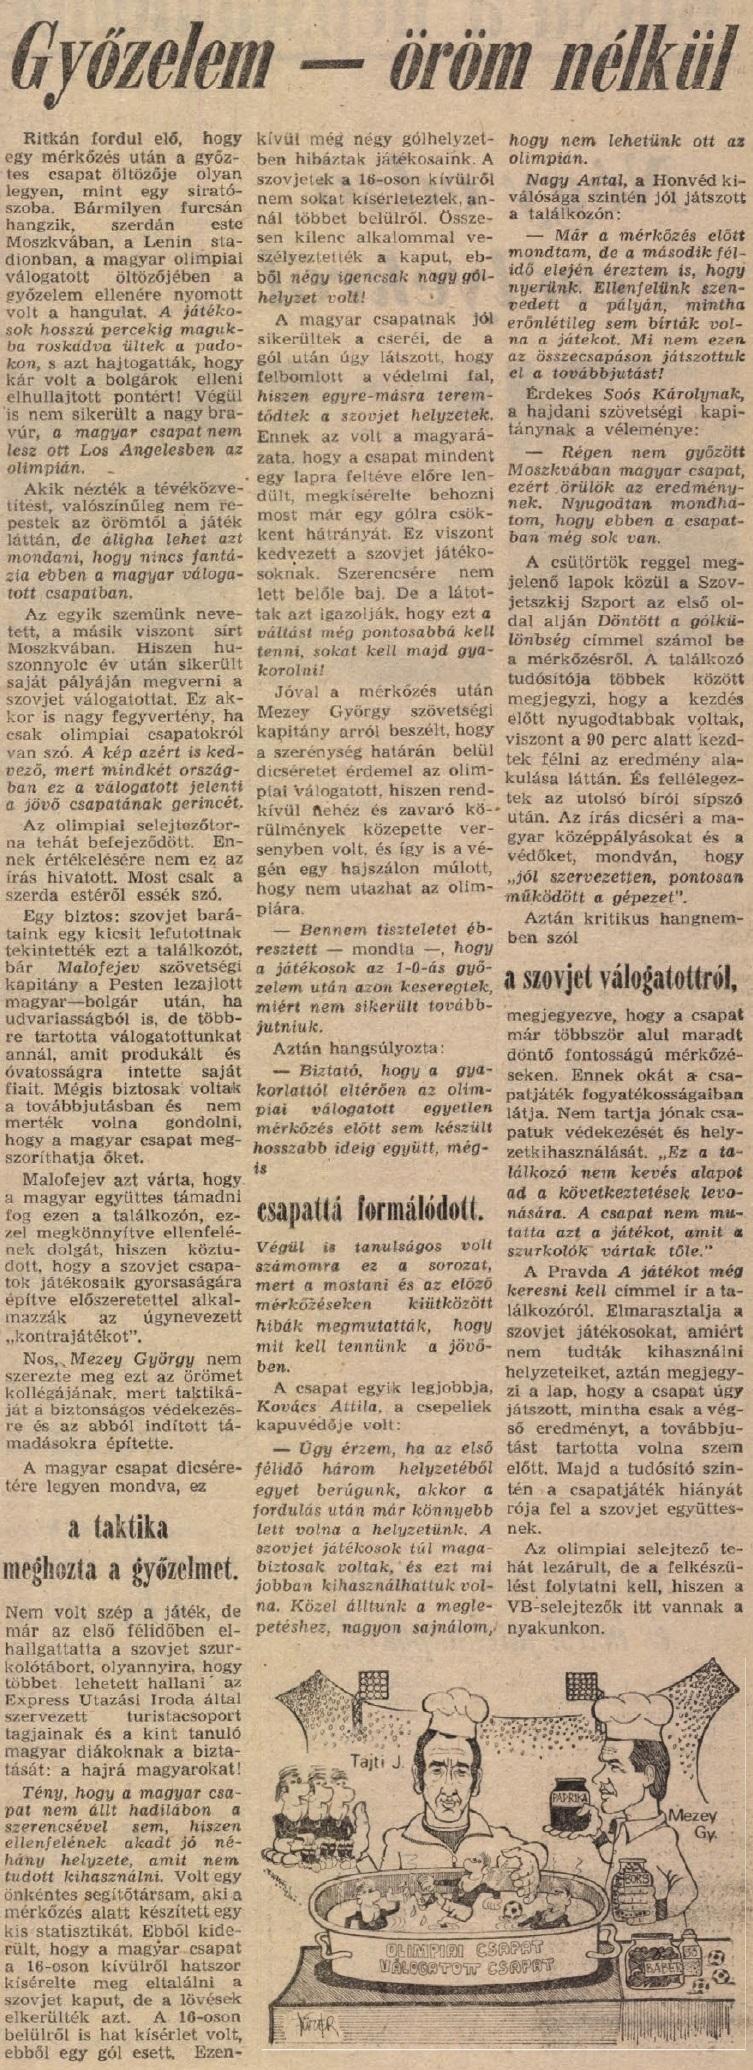 idokapszula_nb_i_1983_84_24_fordulo_szovjetunio_magyarorszag_olimpiai_selejtezo_merkozes_2.jpg